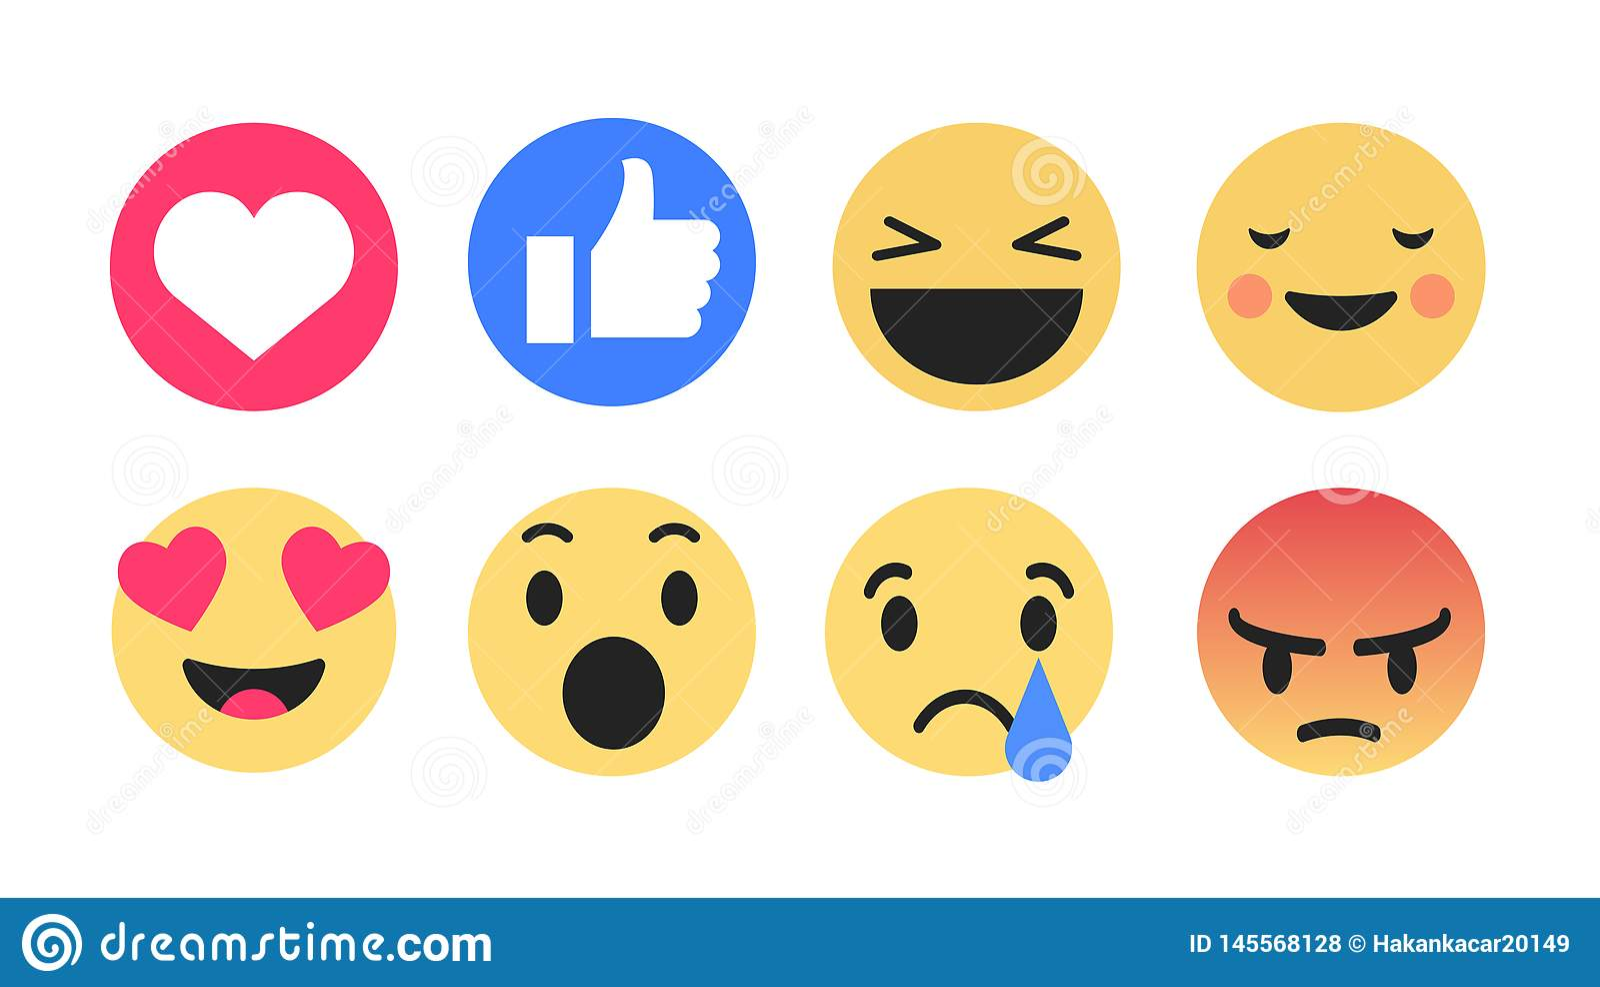 Karikatur-Blase Emoticons des Vektors der hohen Qualität 3d plaudern runde gelbe für Social Media Kommentarreaktionen, Ikonenscha